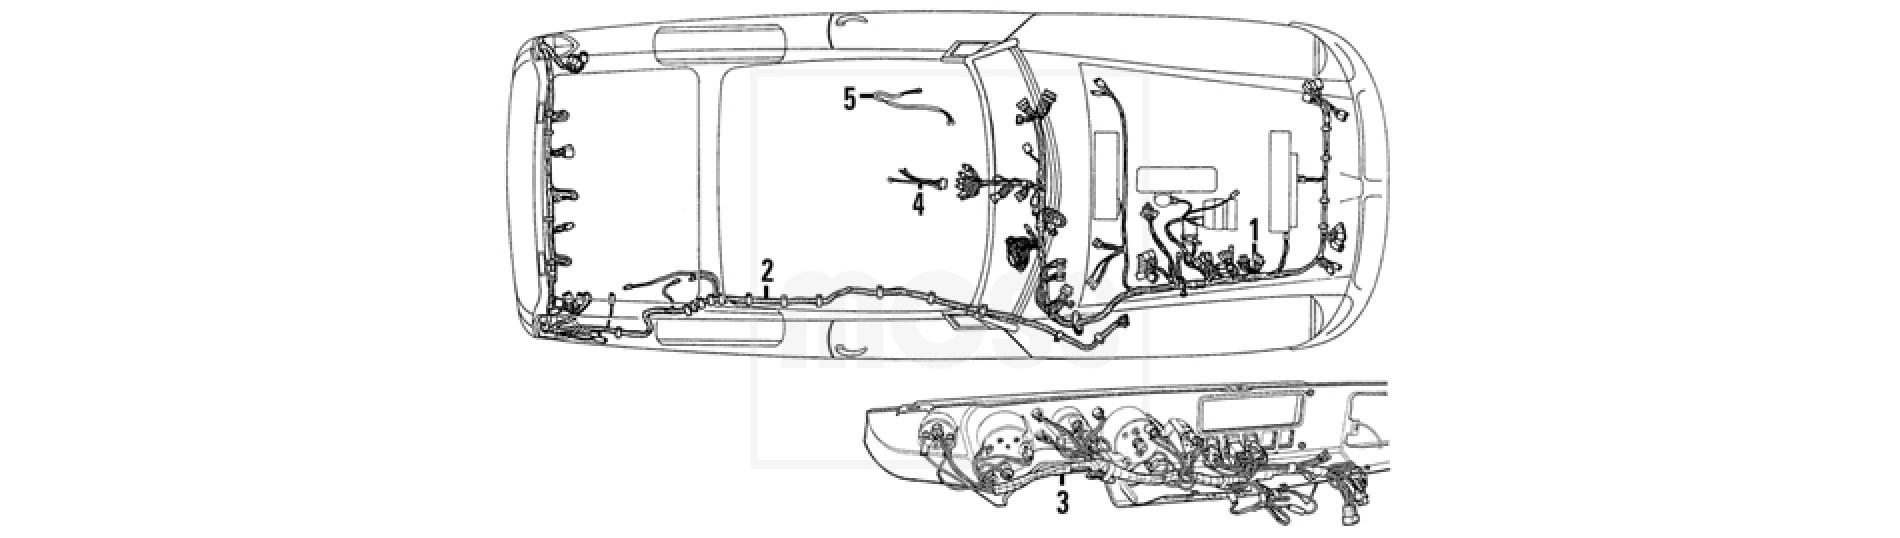 Mgb Wiring Harness - Wiring Diagram M9 on